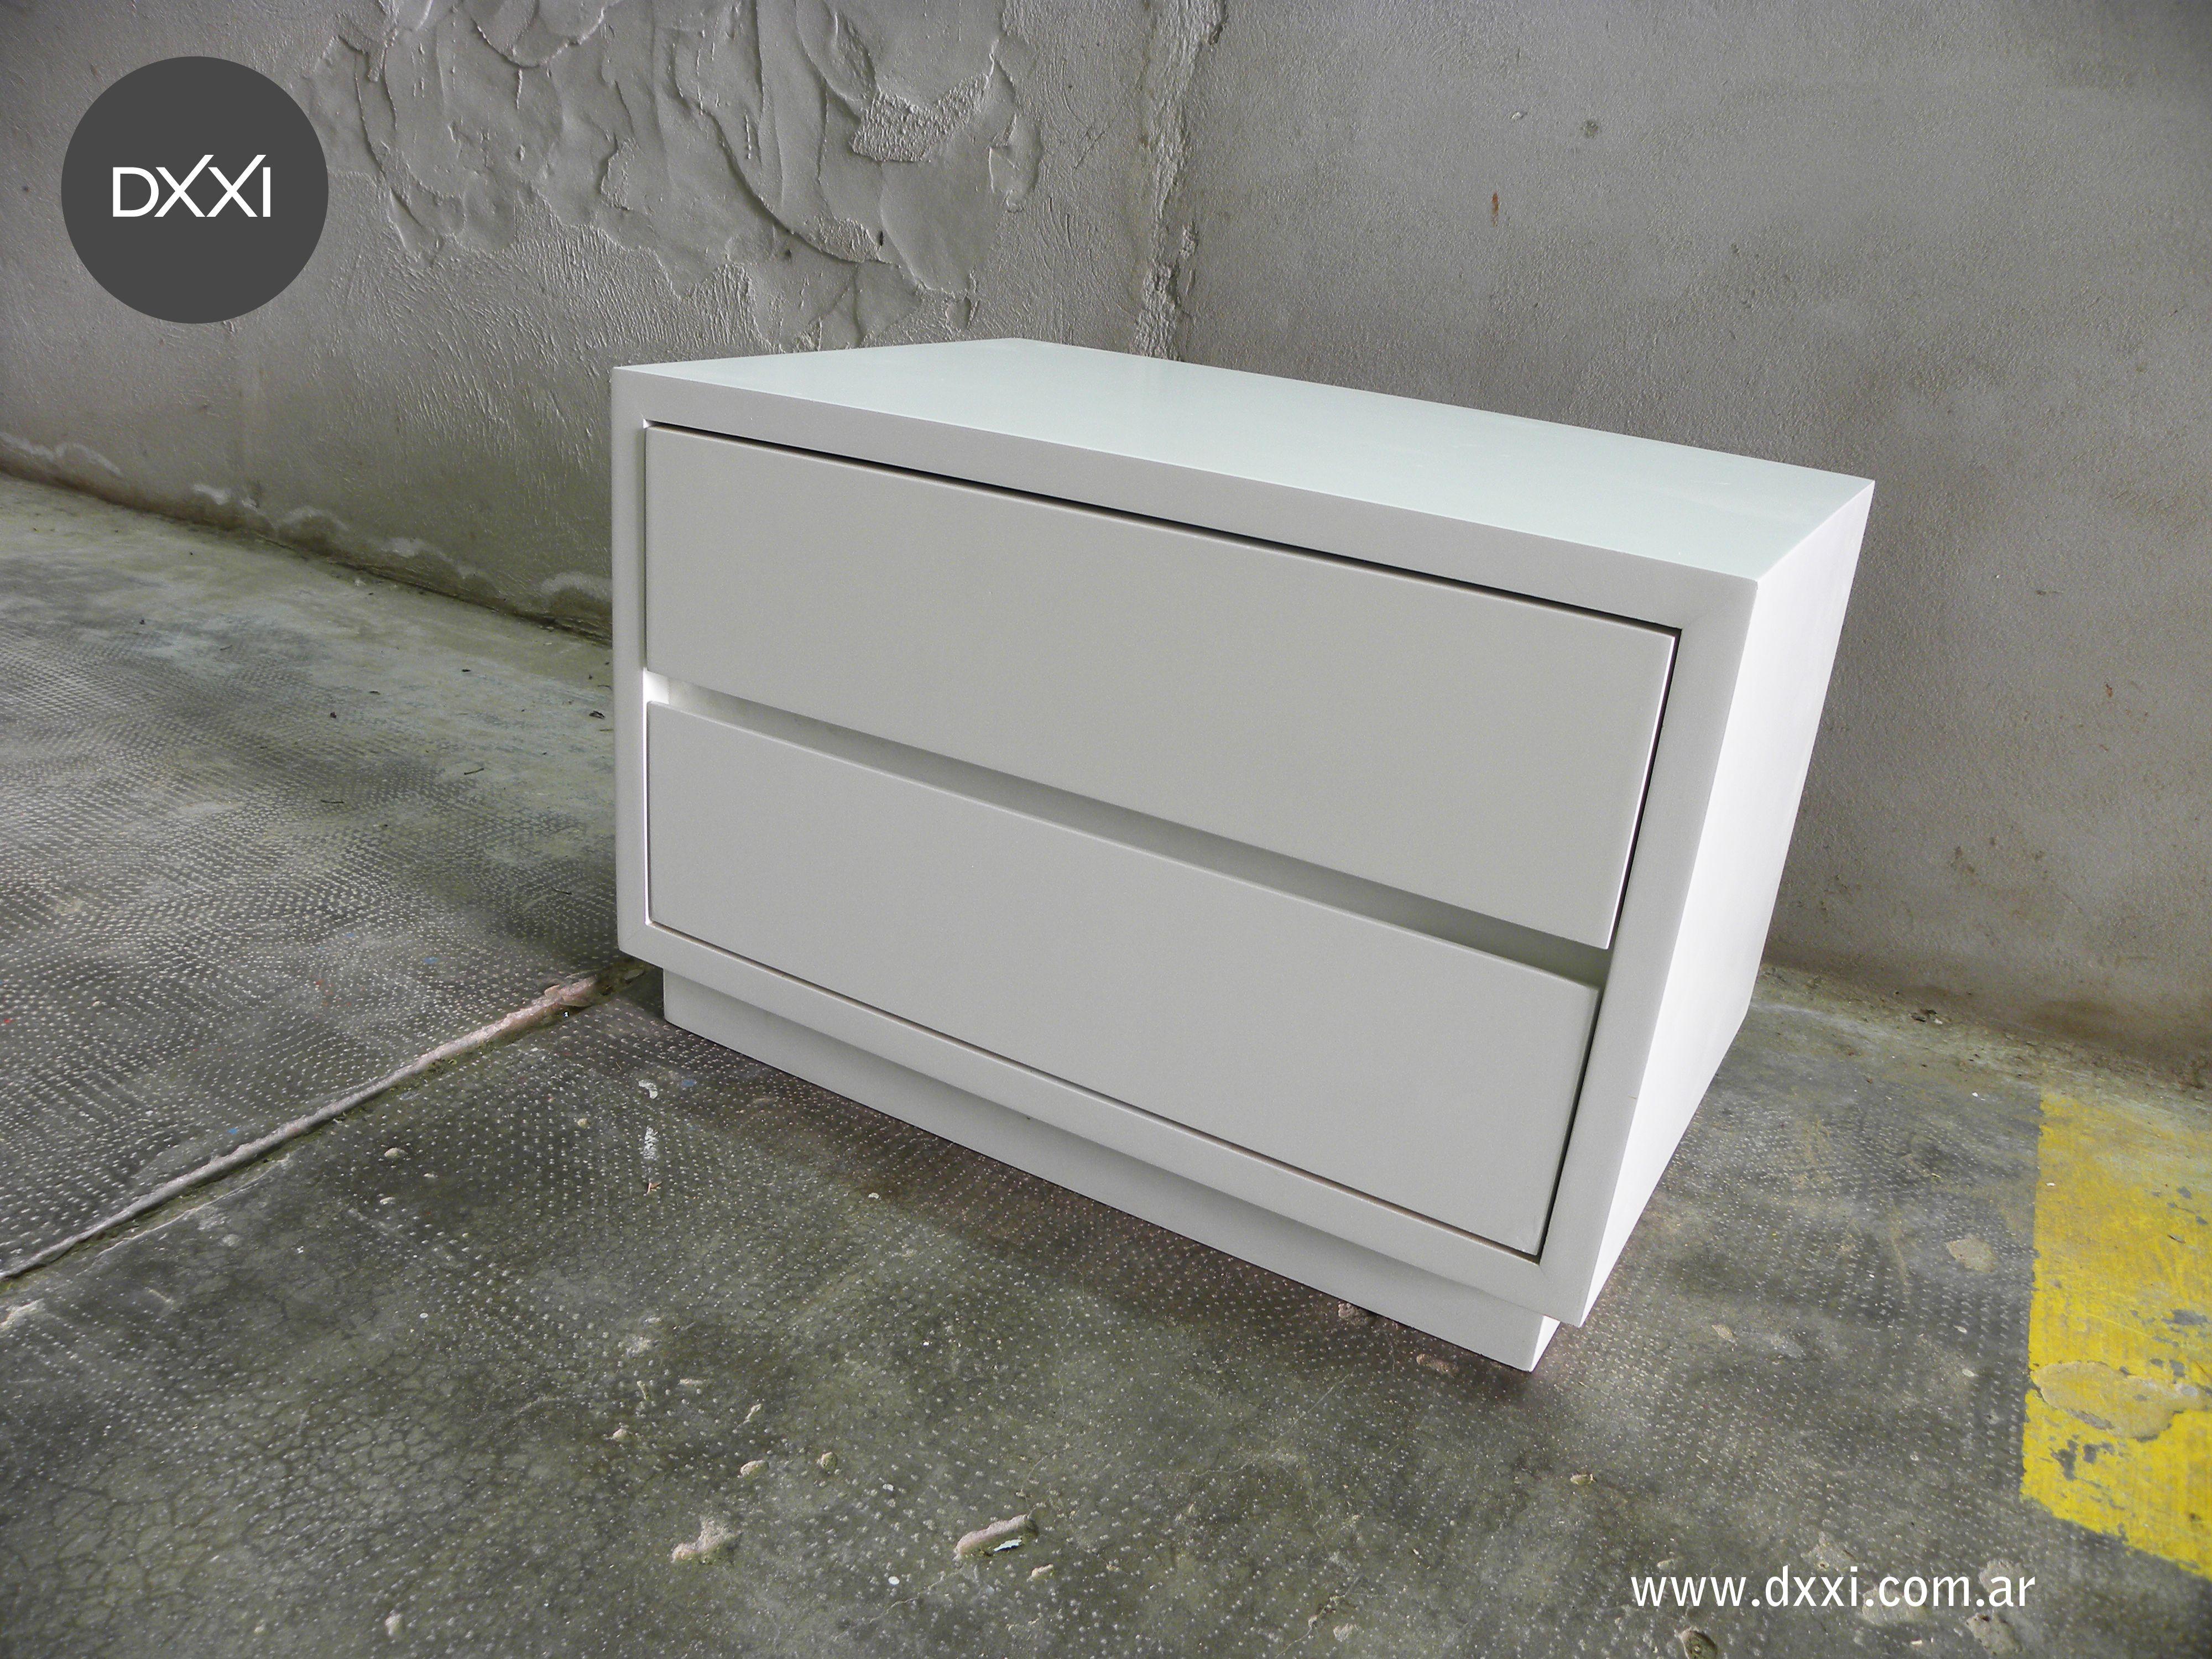 ffb87208 Mesa de luz modelo Net. 2 cajones con correderas telecopicas. MDF laqueado  blanco semi mate. www.dxxi.com.ar #dxxi #muebles #furniture #madera #wood #  ...